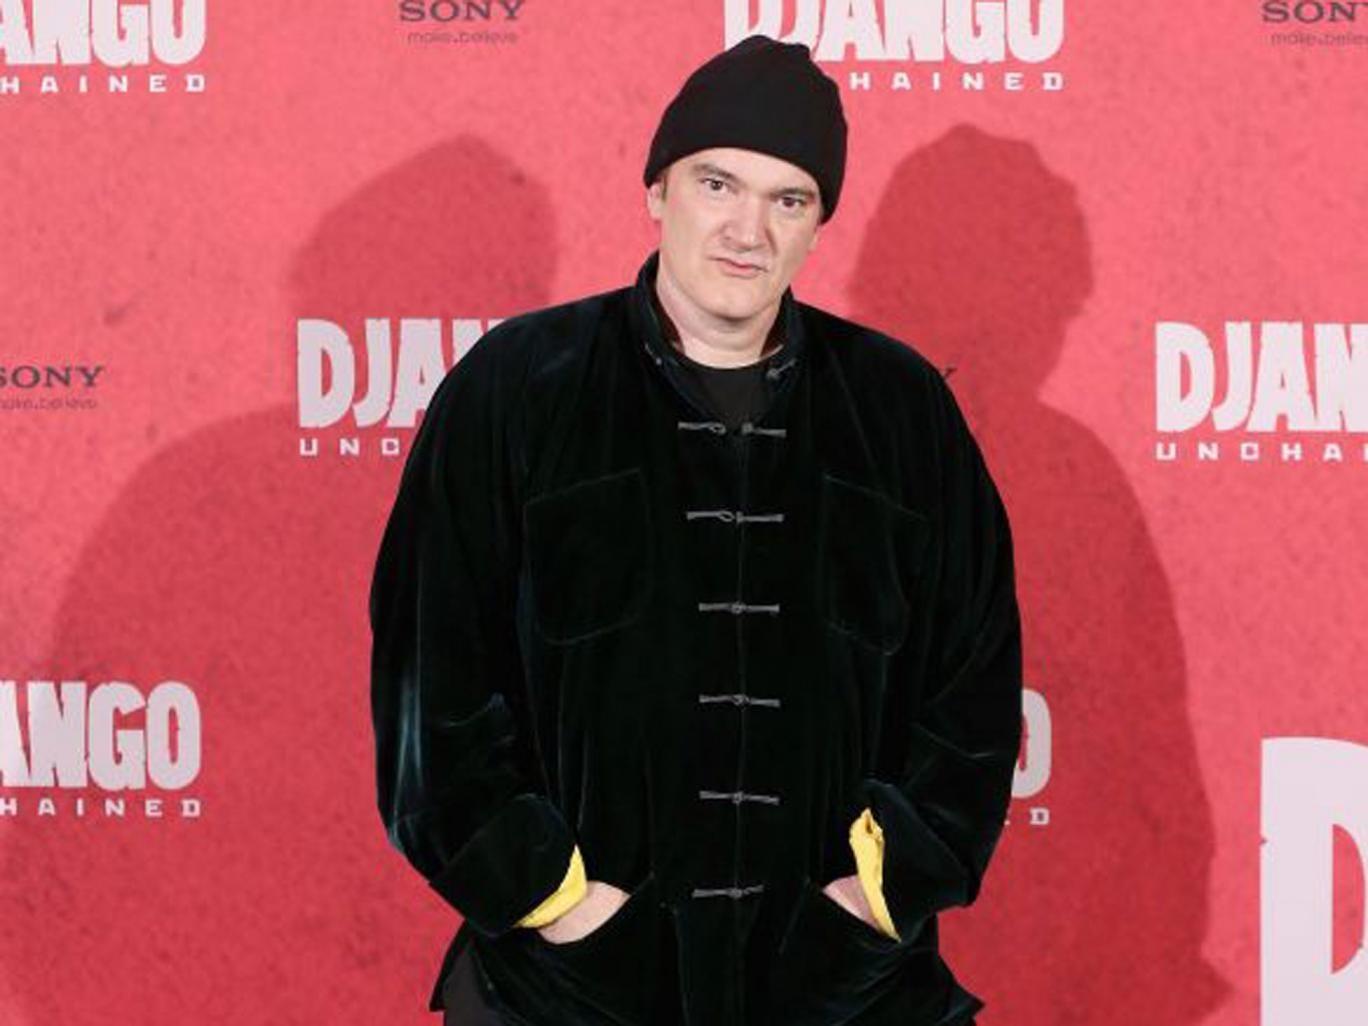 Quentin Tarantino, director